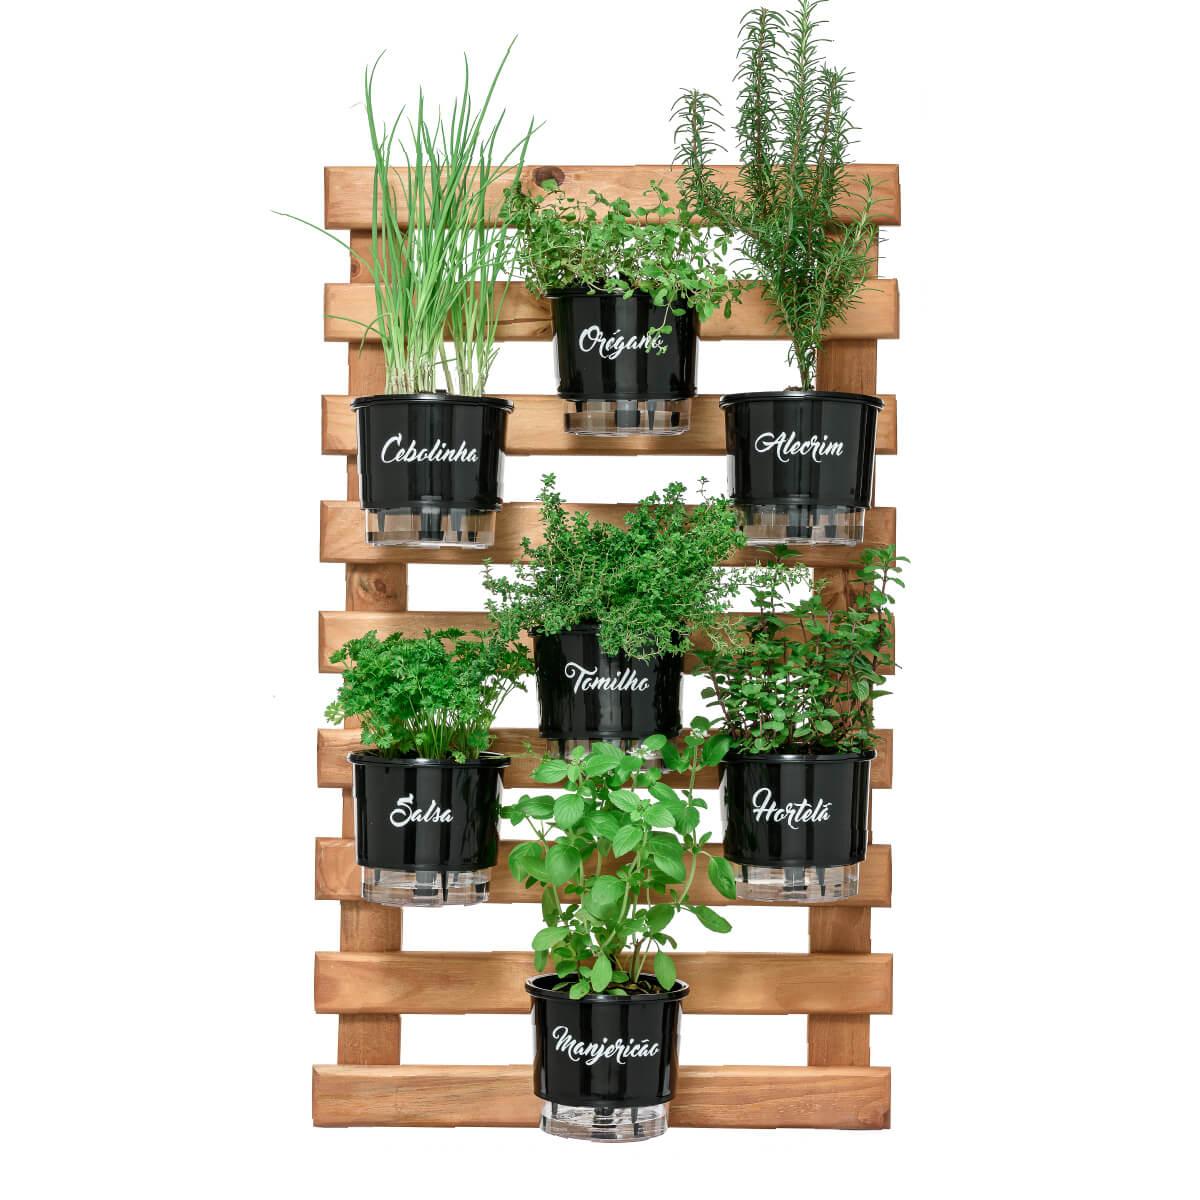 Kit Horta Vertical 60cm x 100cm com 7 Vasos Pretos Gourmet  - Loja Raiz